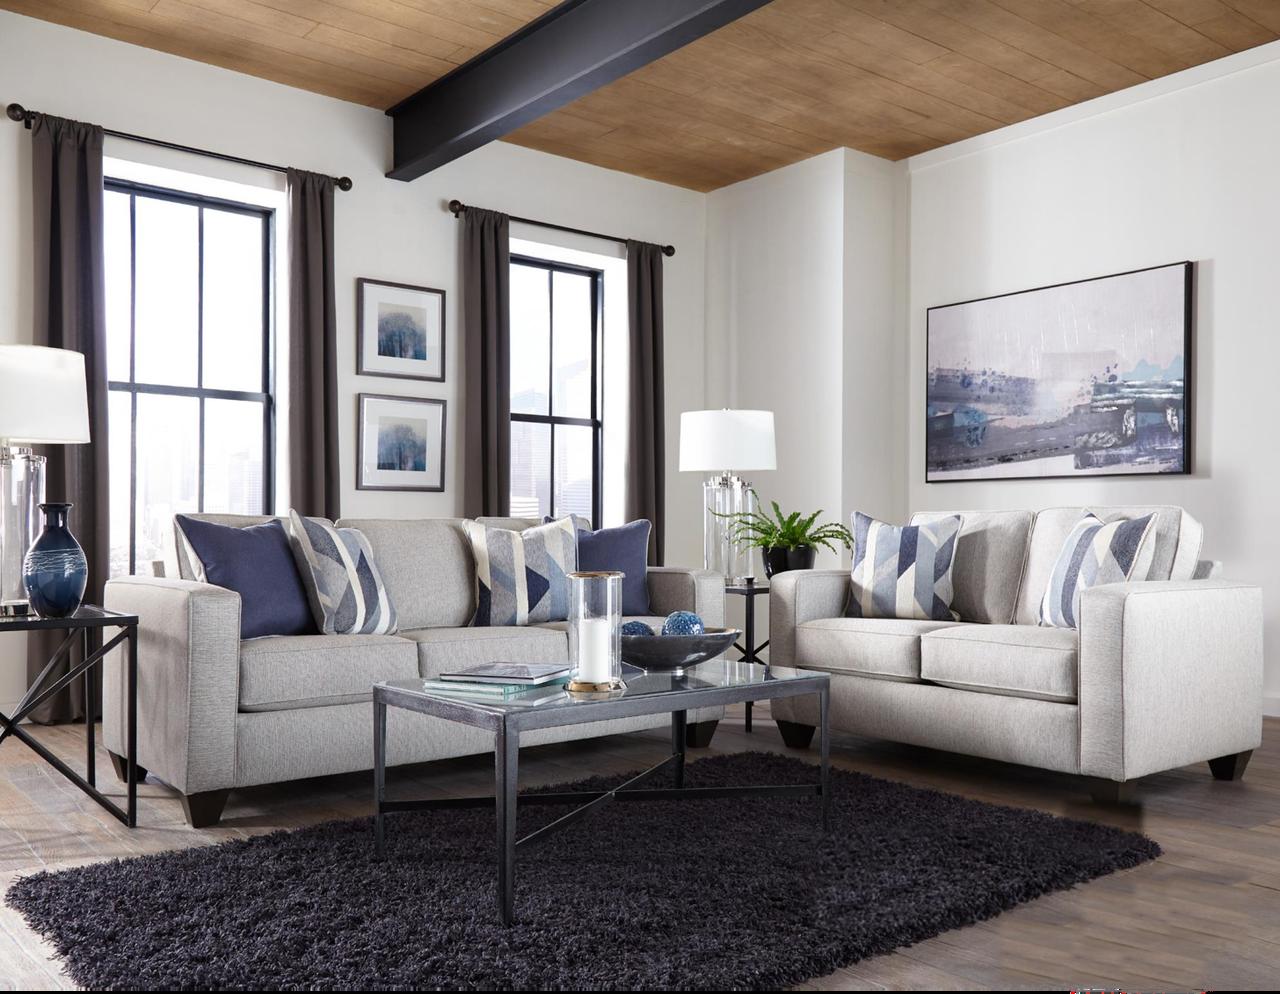 Albany Crypton Slate Sofa Loveseat Set Savvy Discount Furniture Living Room Sets Sofa And Loveseat Set Coastal Living Rooms #velletri #pewter #living #room #set